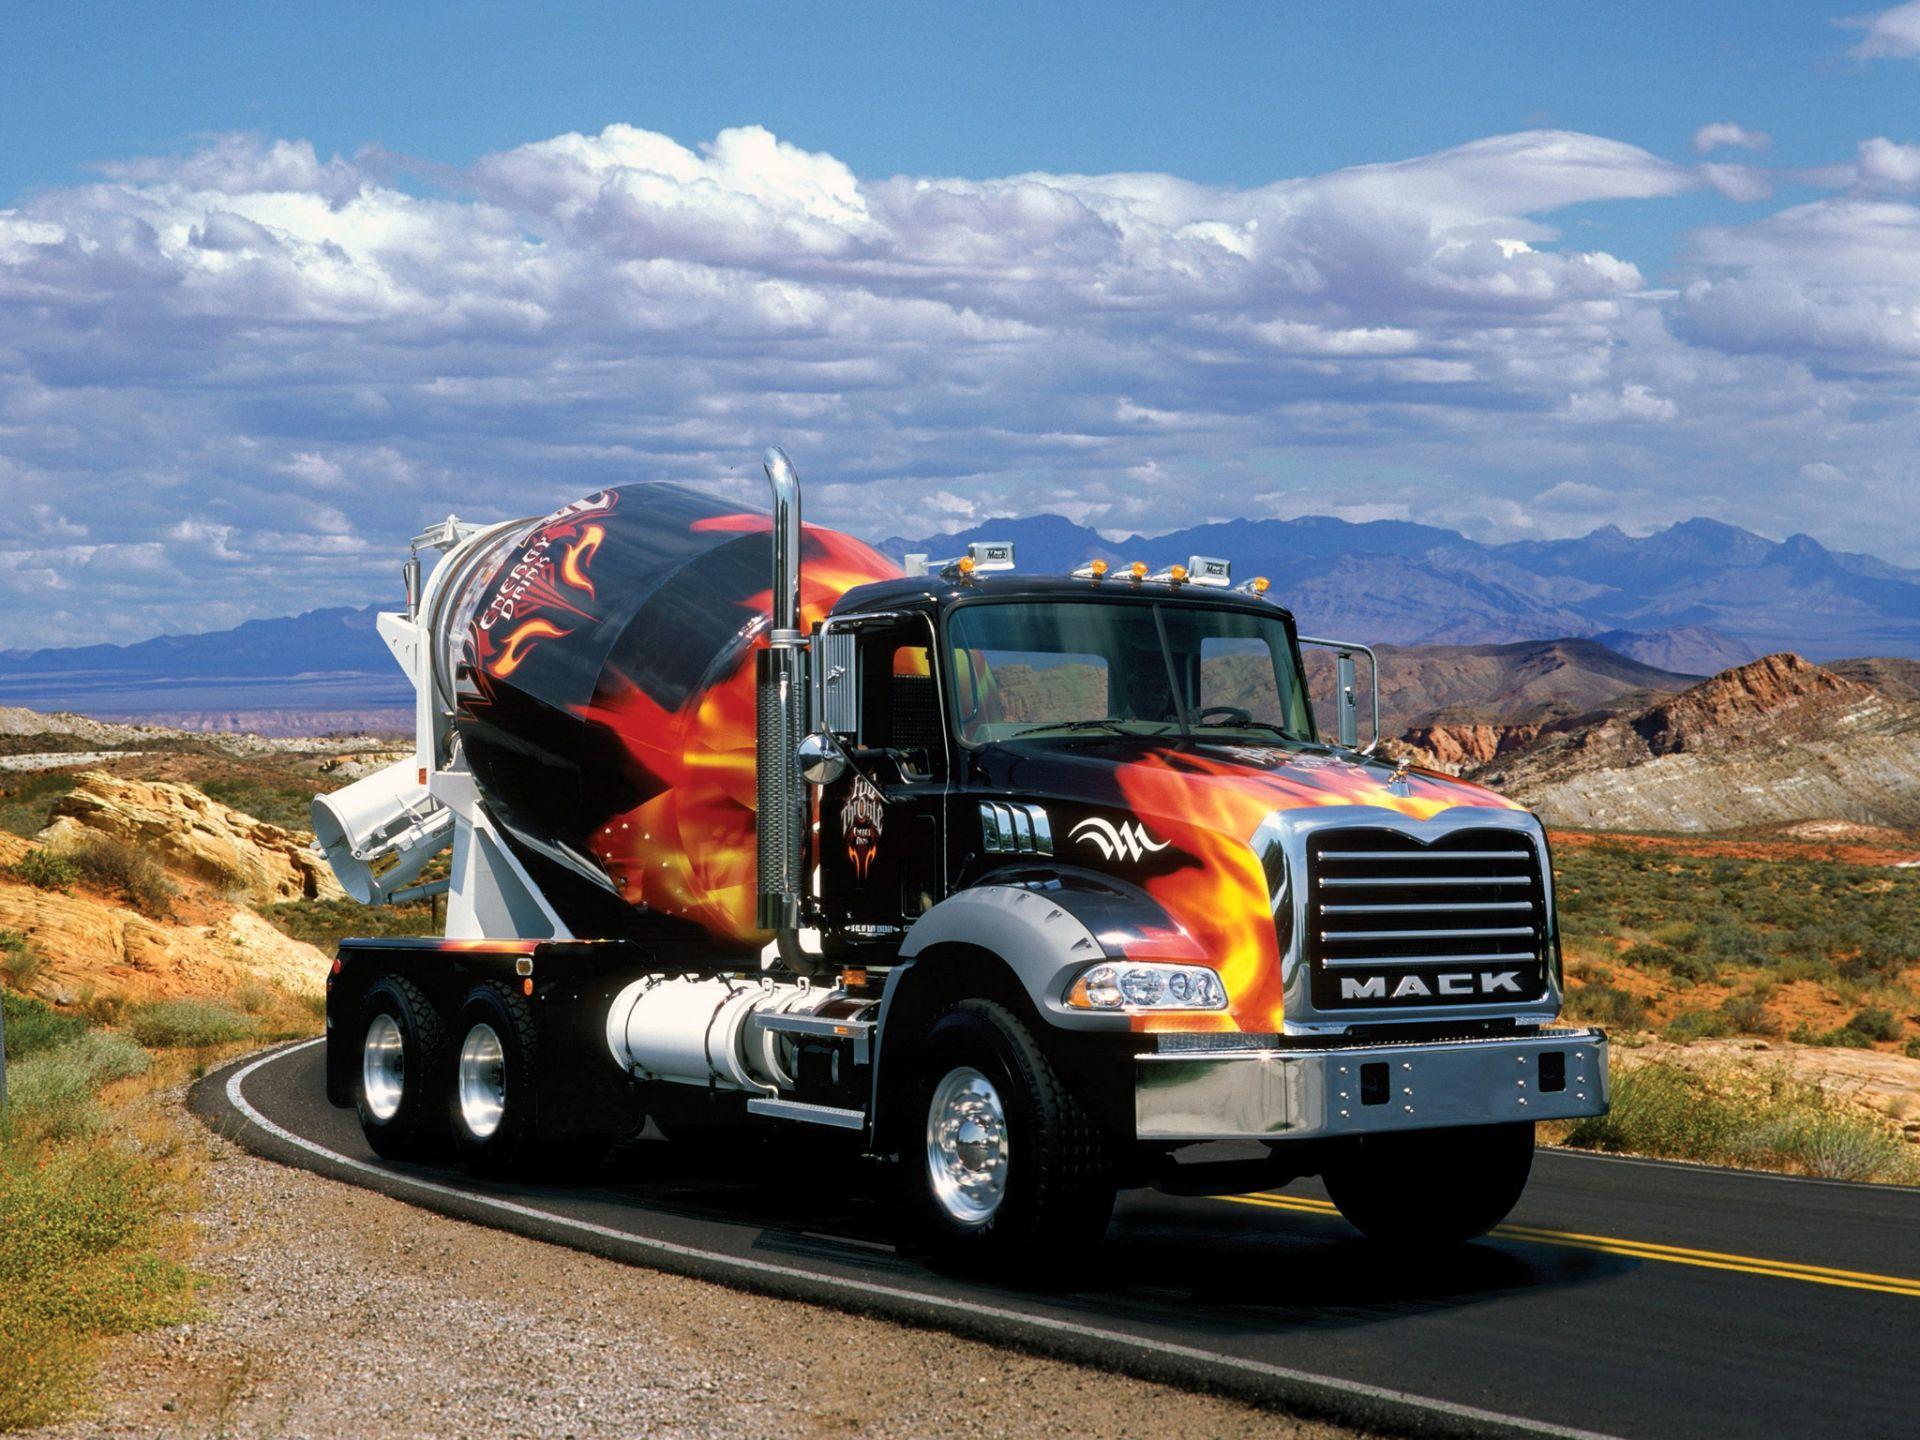 скорость проходки фото обои на рабочий стол грузовики заказ через